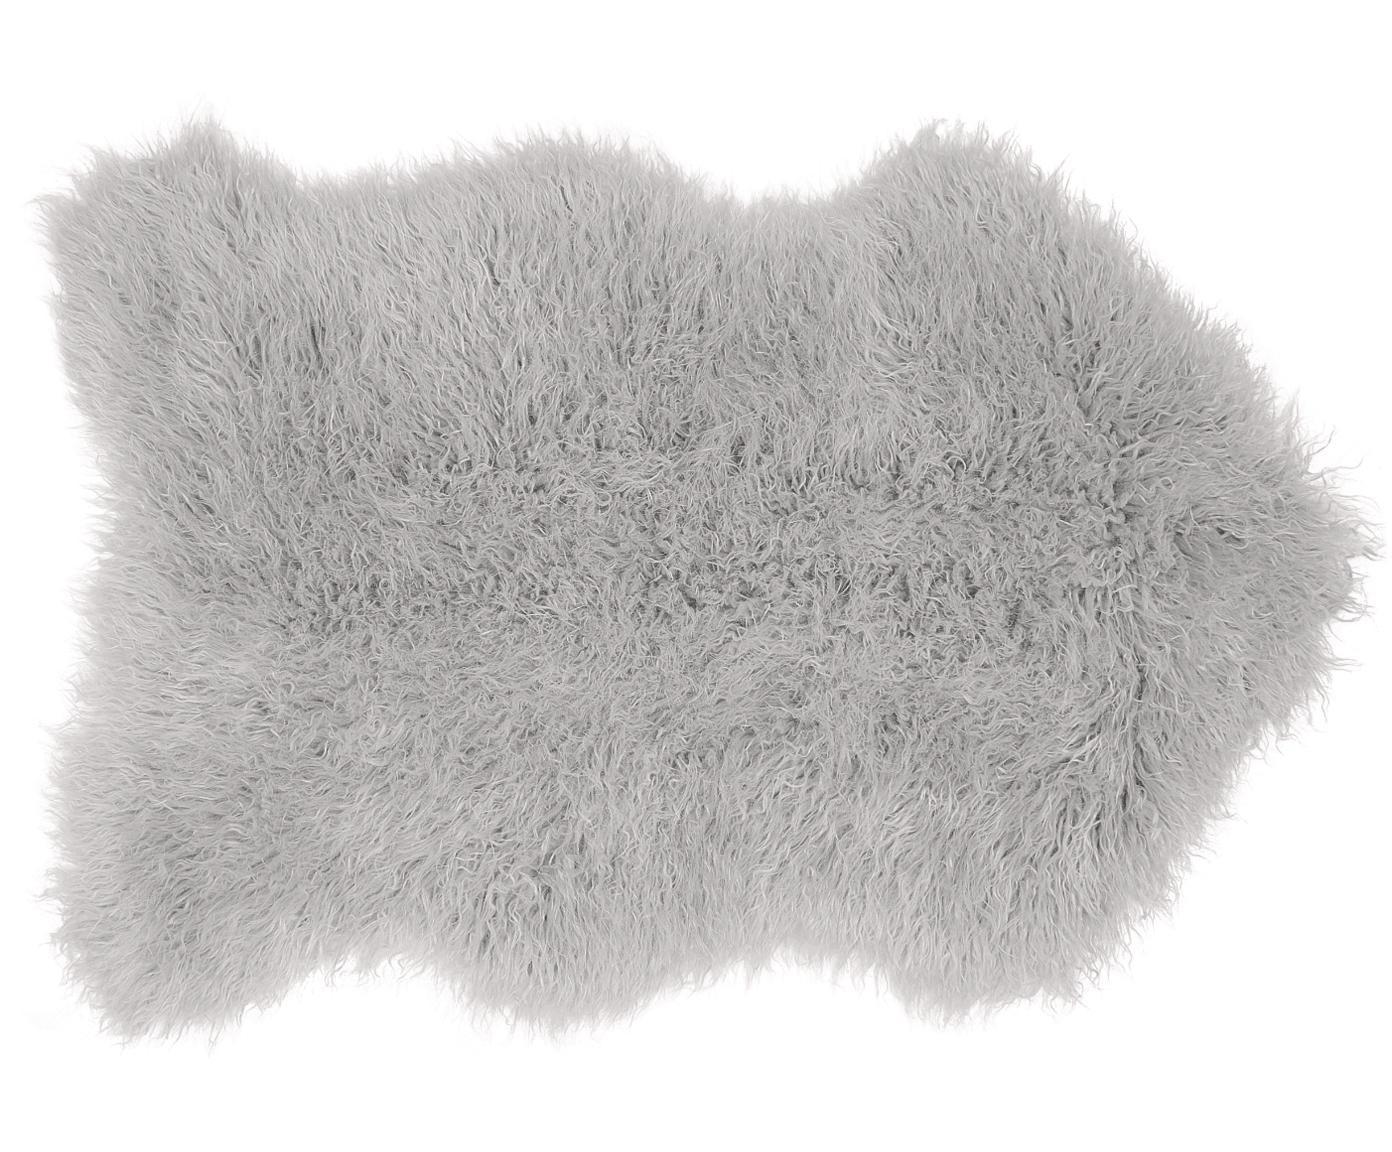 Ecopelliccia riccia Morten, Grigio chiaro, Larg. 60 x Lung. 90 cm